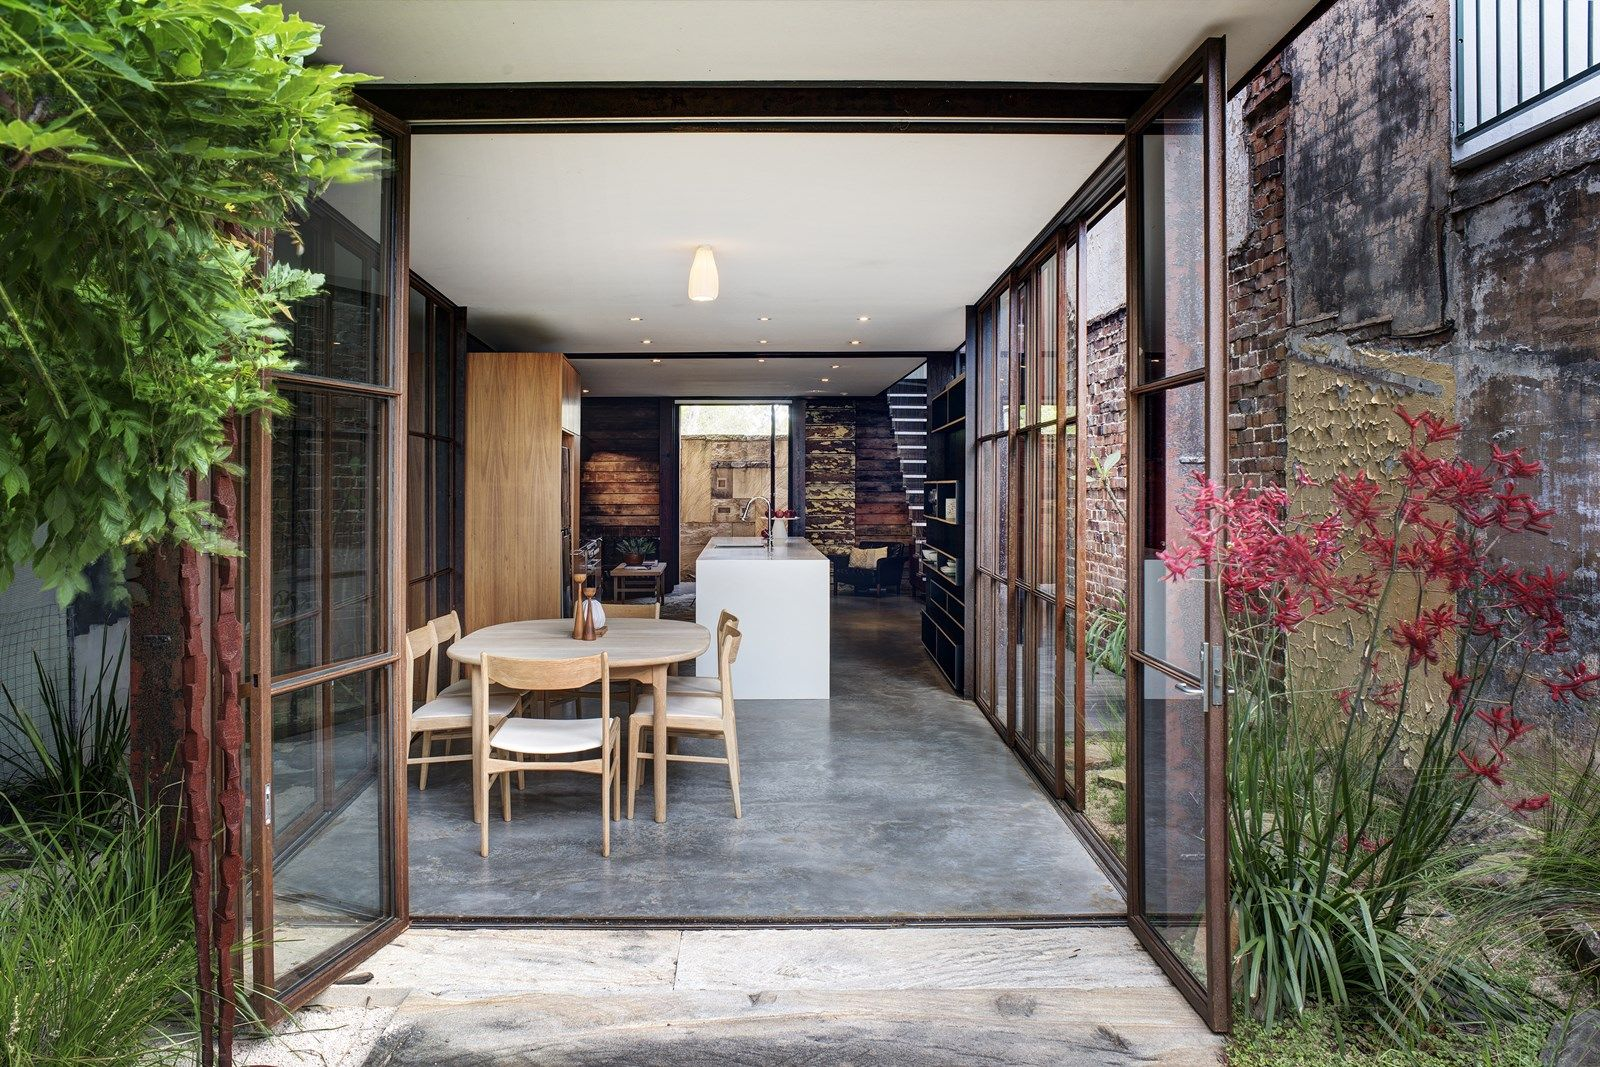 132 Salisbury Road, Camperdown NSW 2050 House For Sale